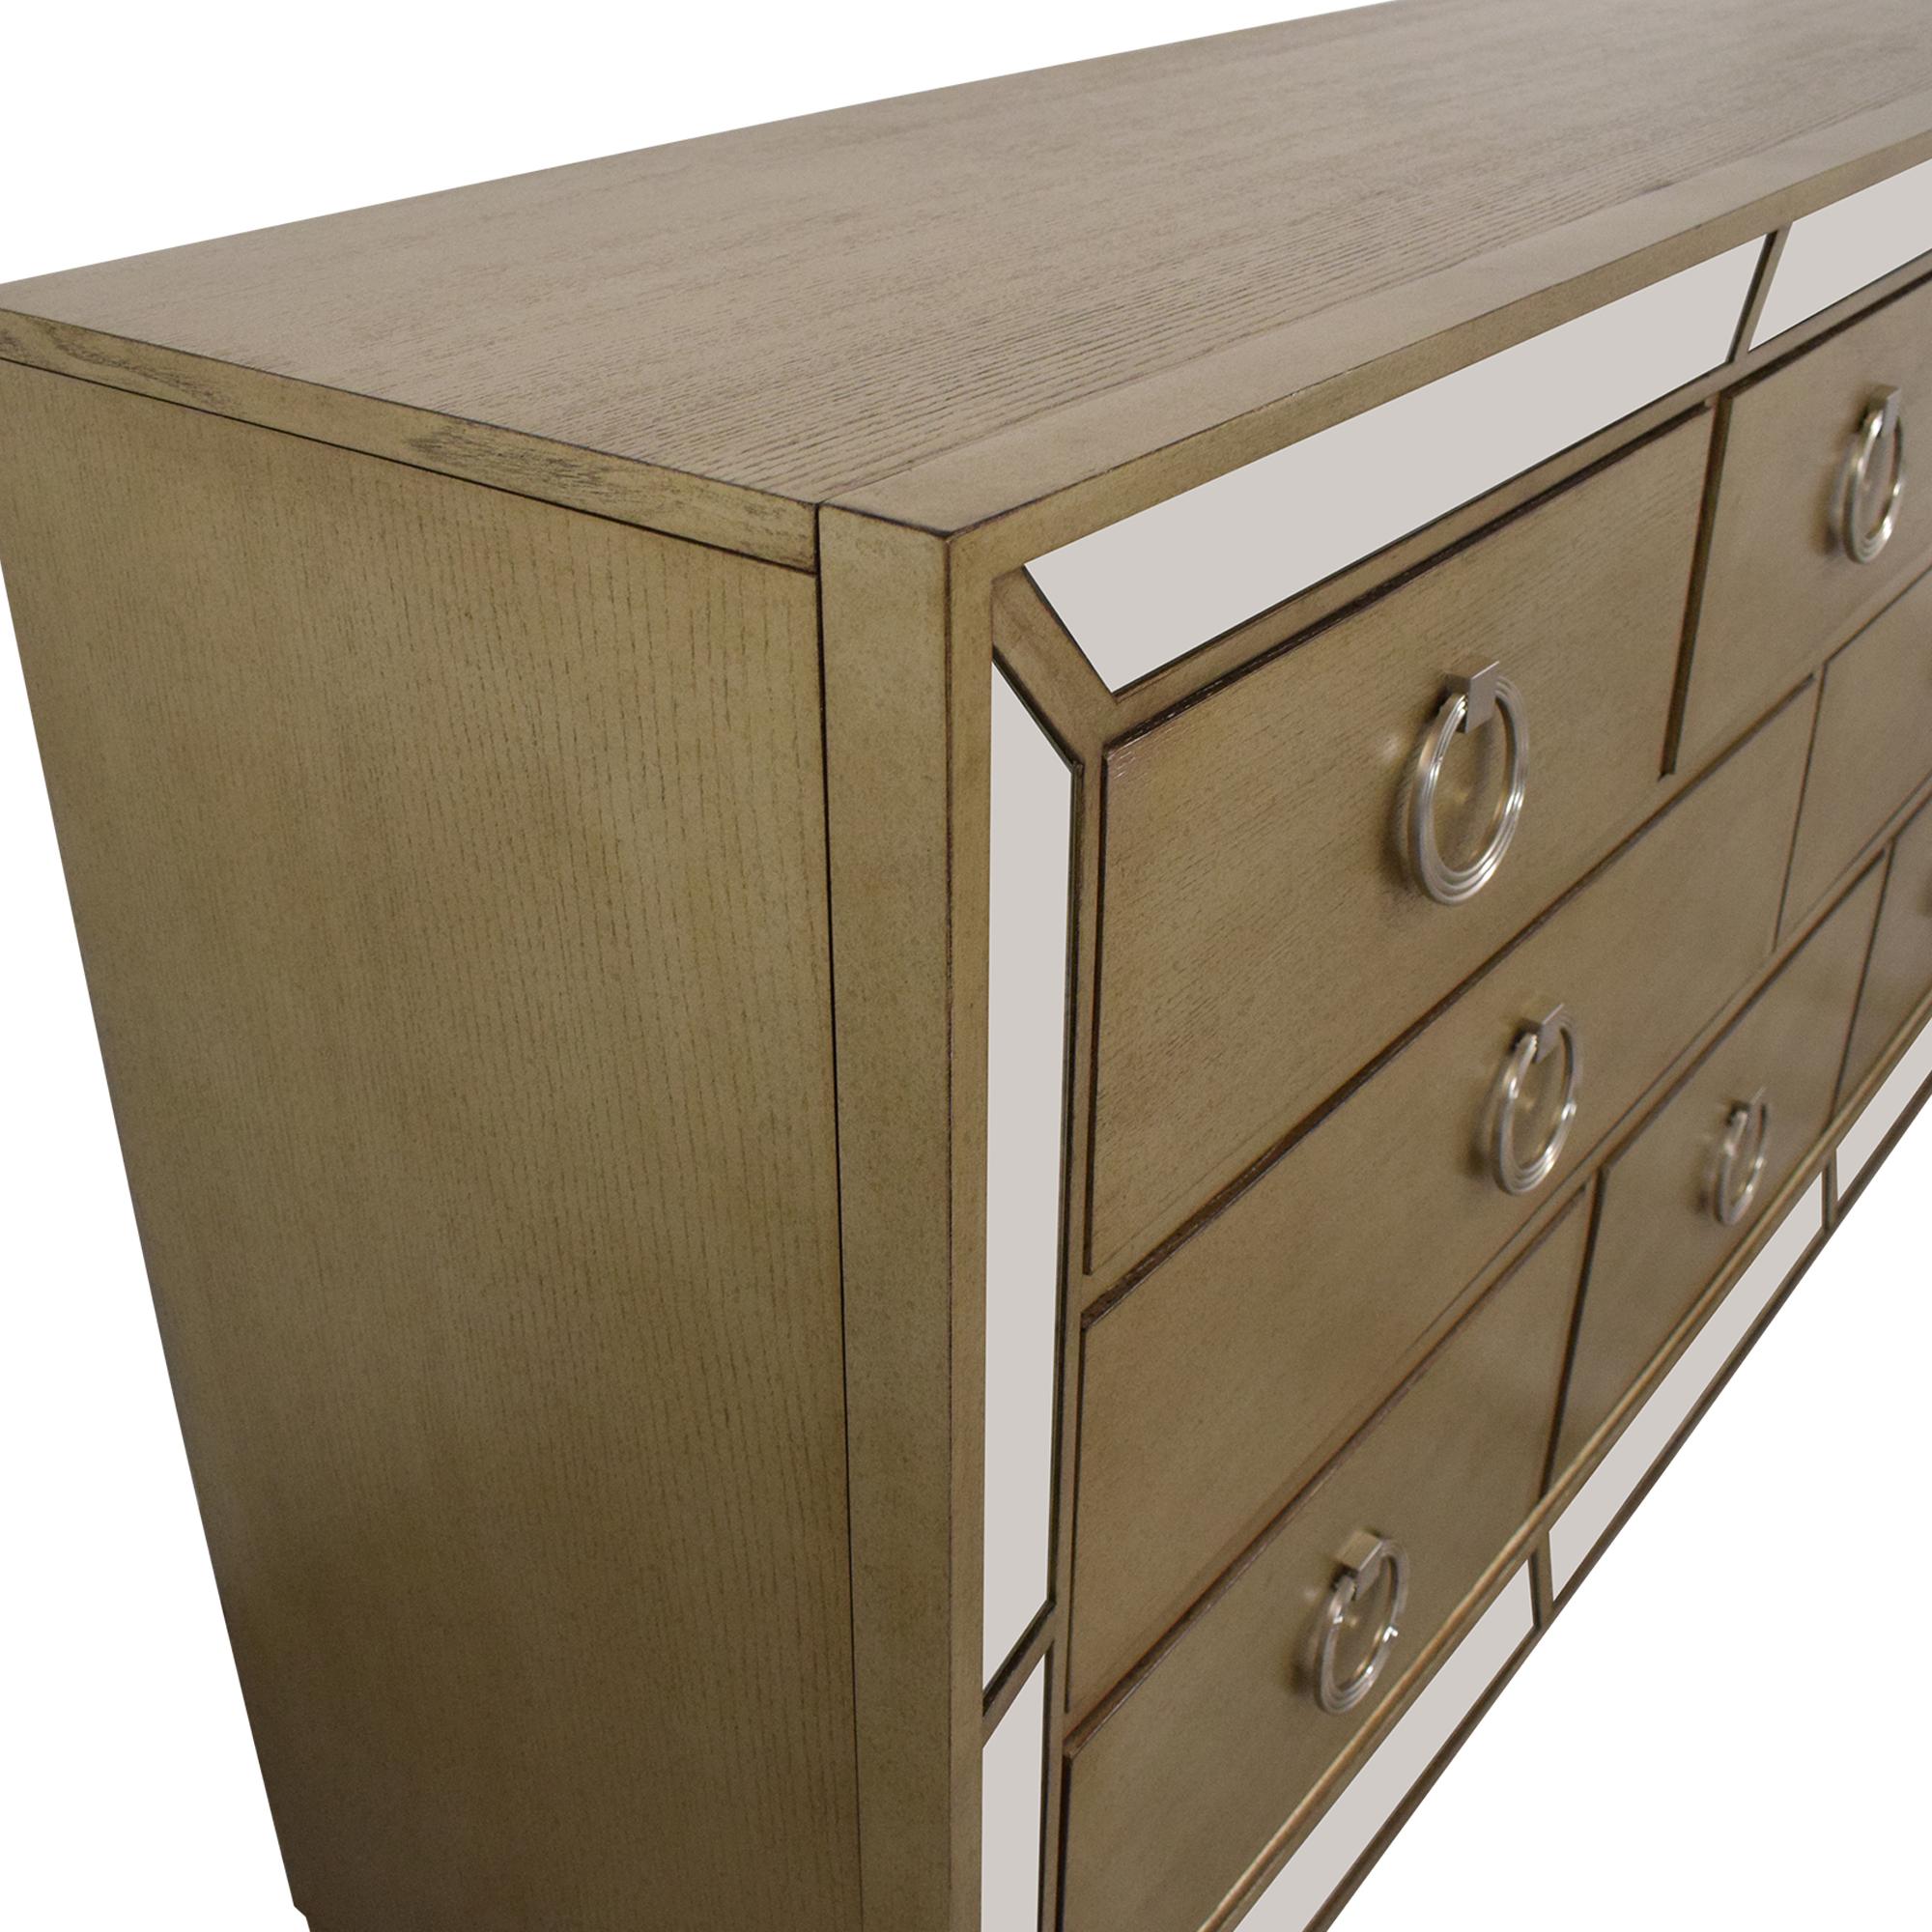 Macy's Ailey Eight Drawer Dresser / Dressers